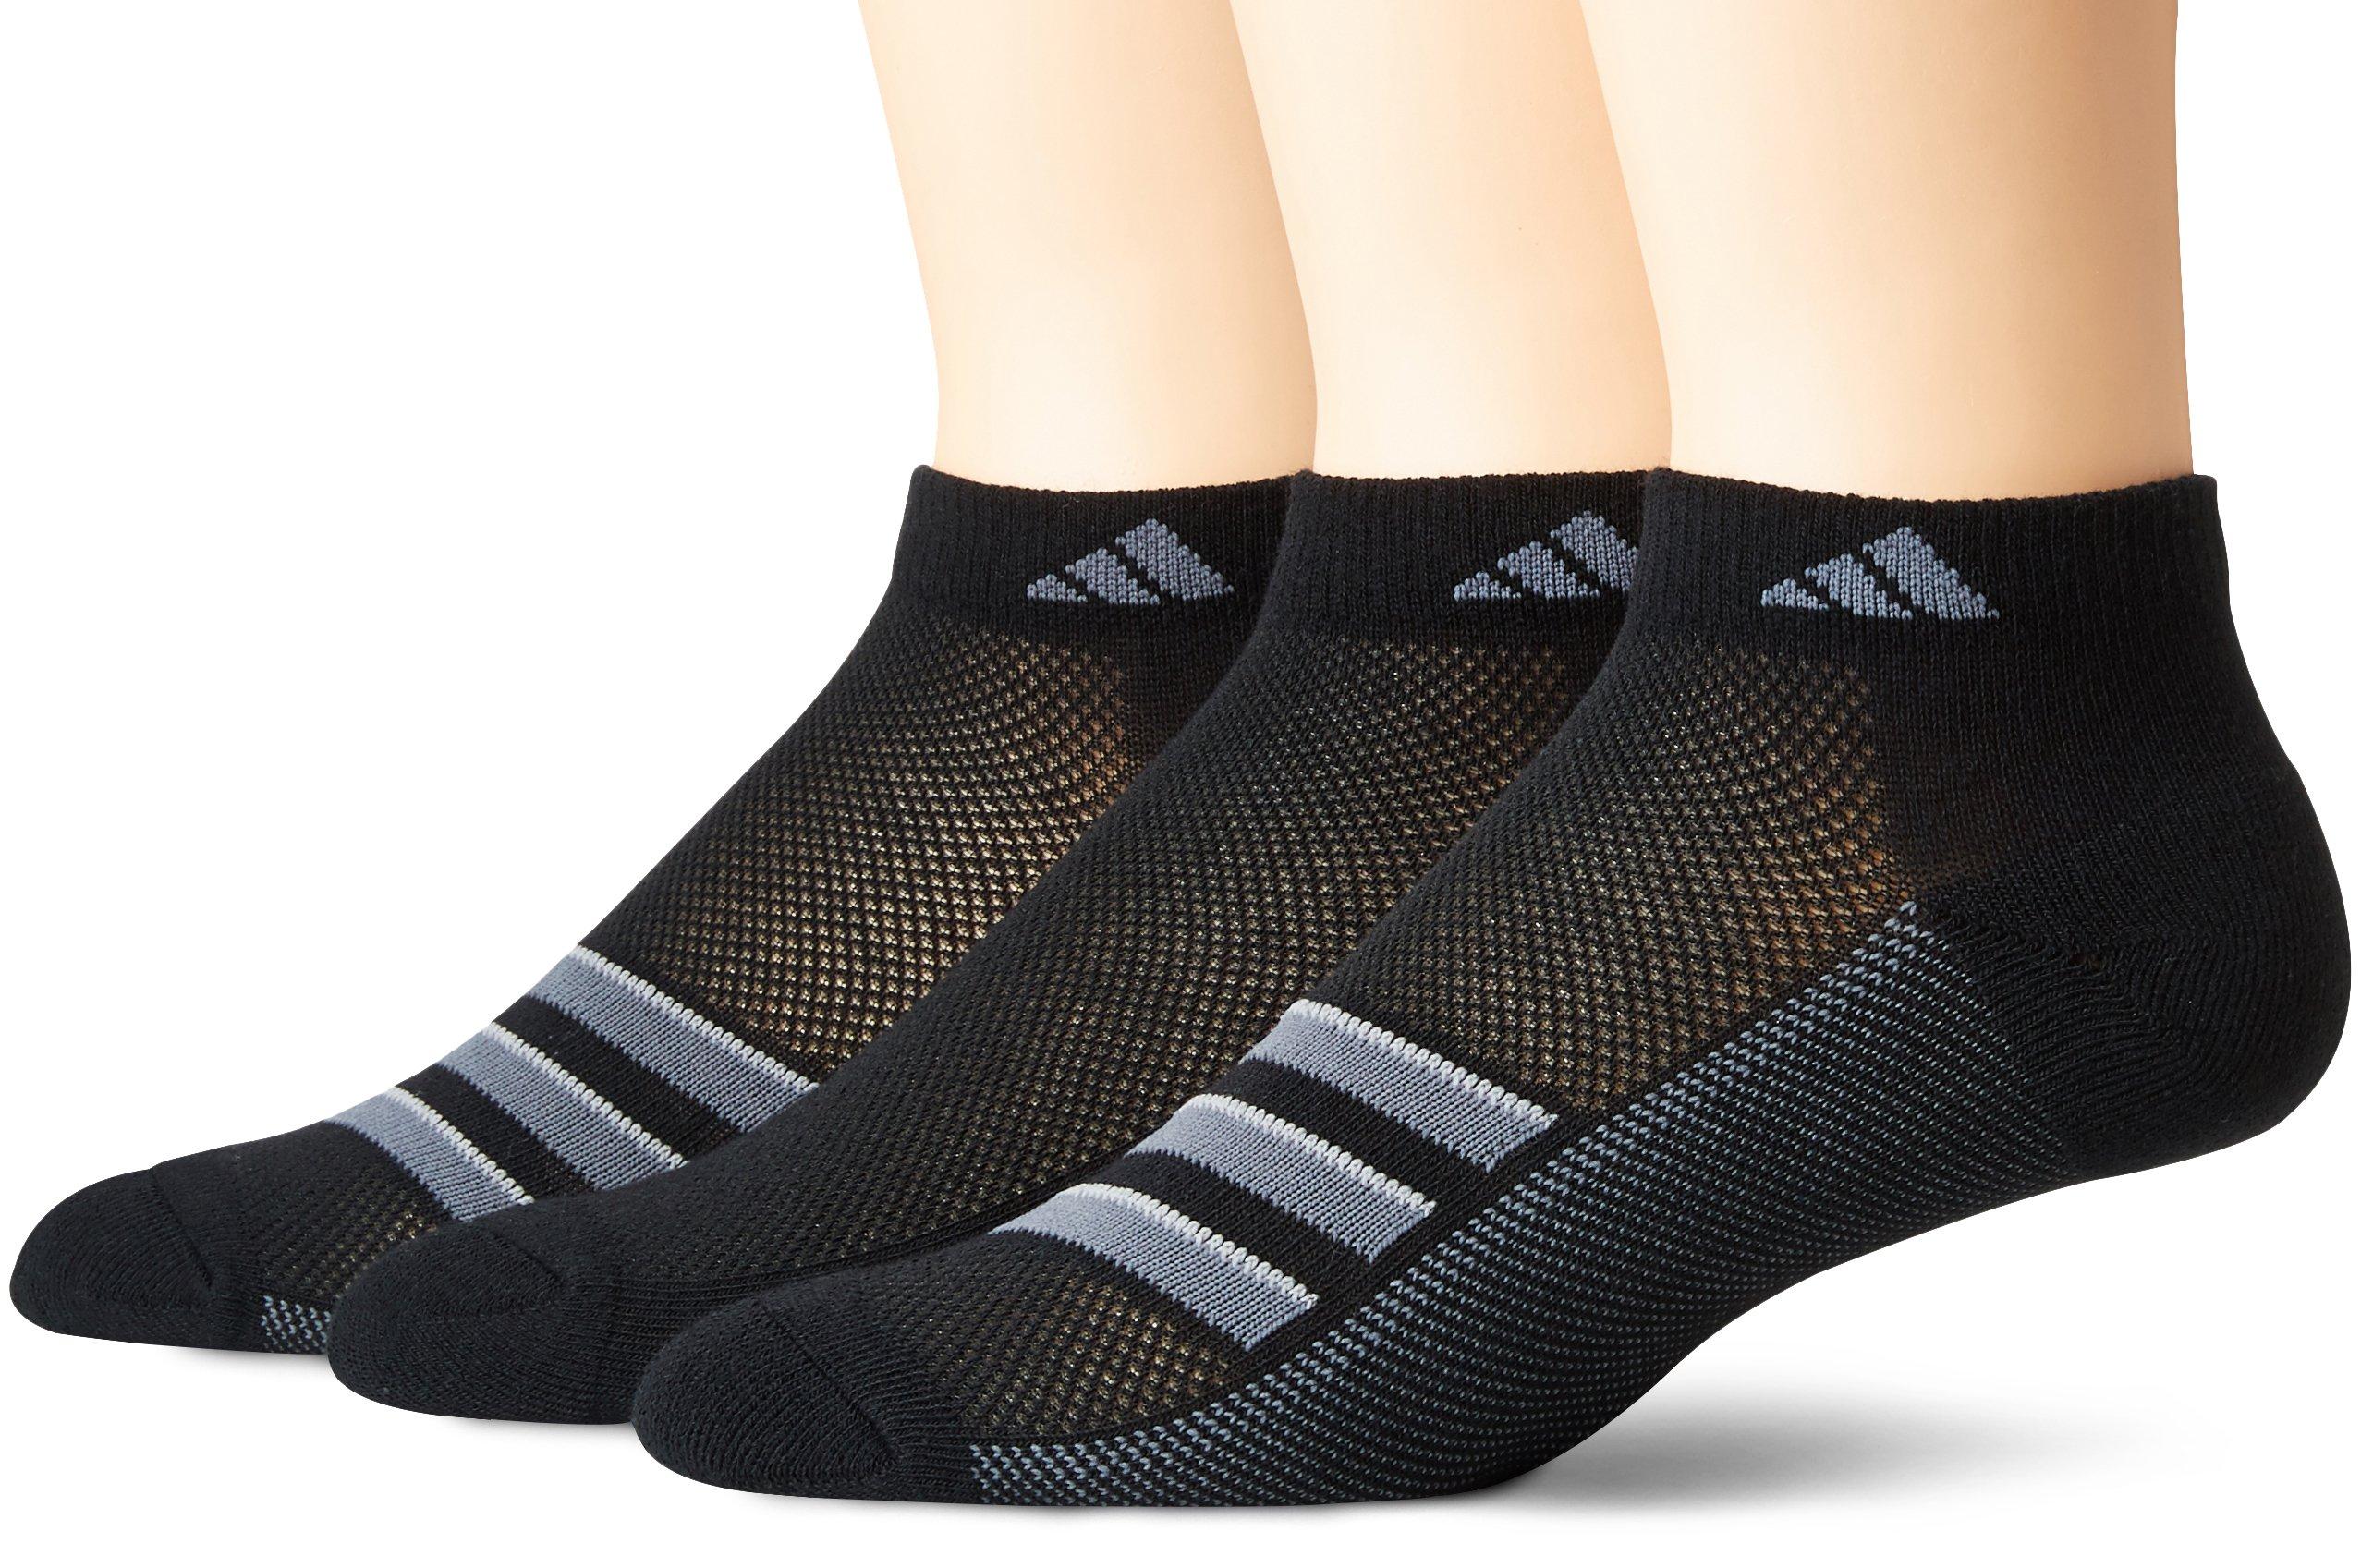 adidas Men's Climacool Superlite Low Cut Socks (3-Pack), Black/Onix/Light Onix, Size 12-16